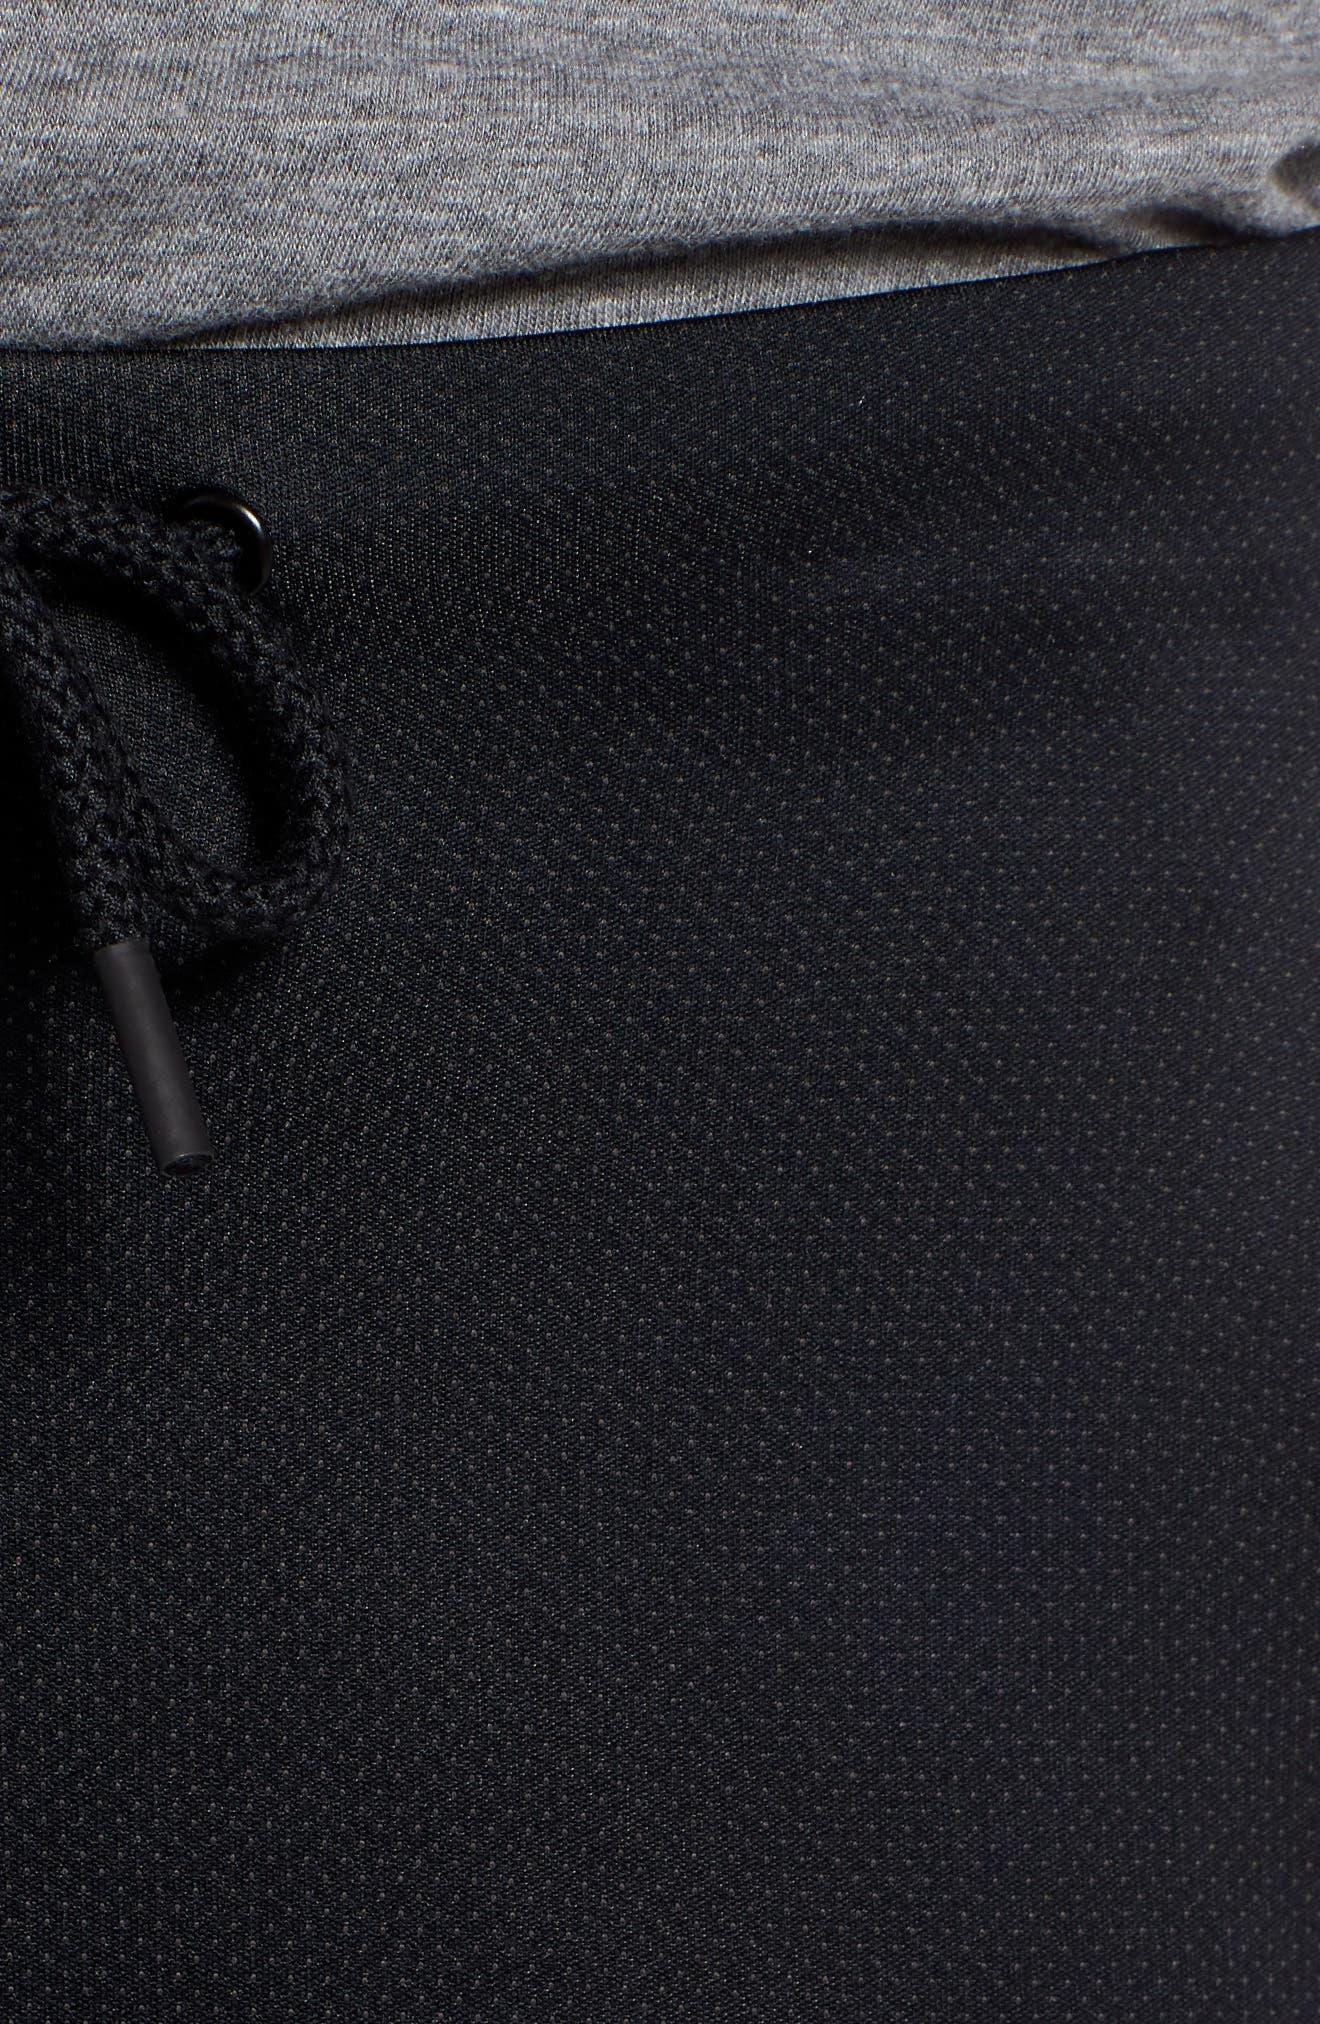 Unstoppable Move Airgap Pants,                             Alternate thumbnail 4, color,                             BLACK/ CHARCOAL/ BLACK